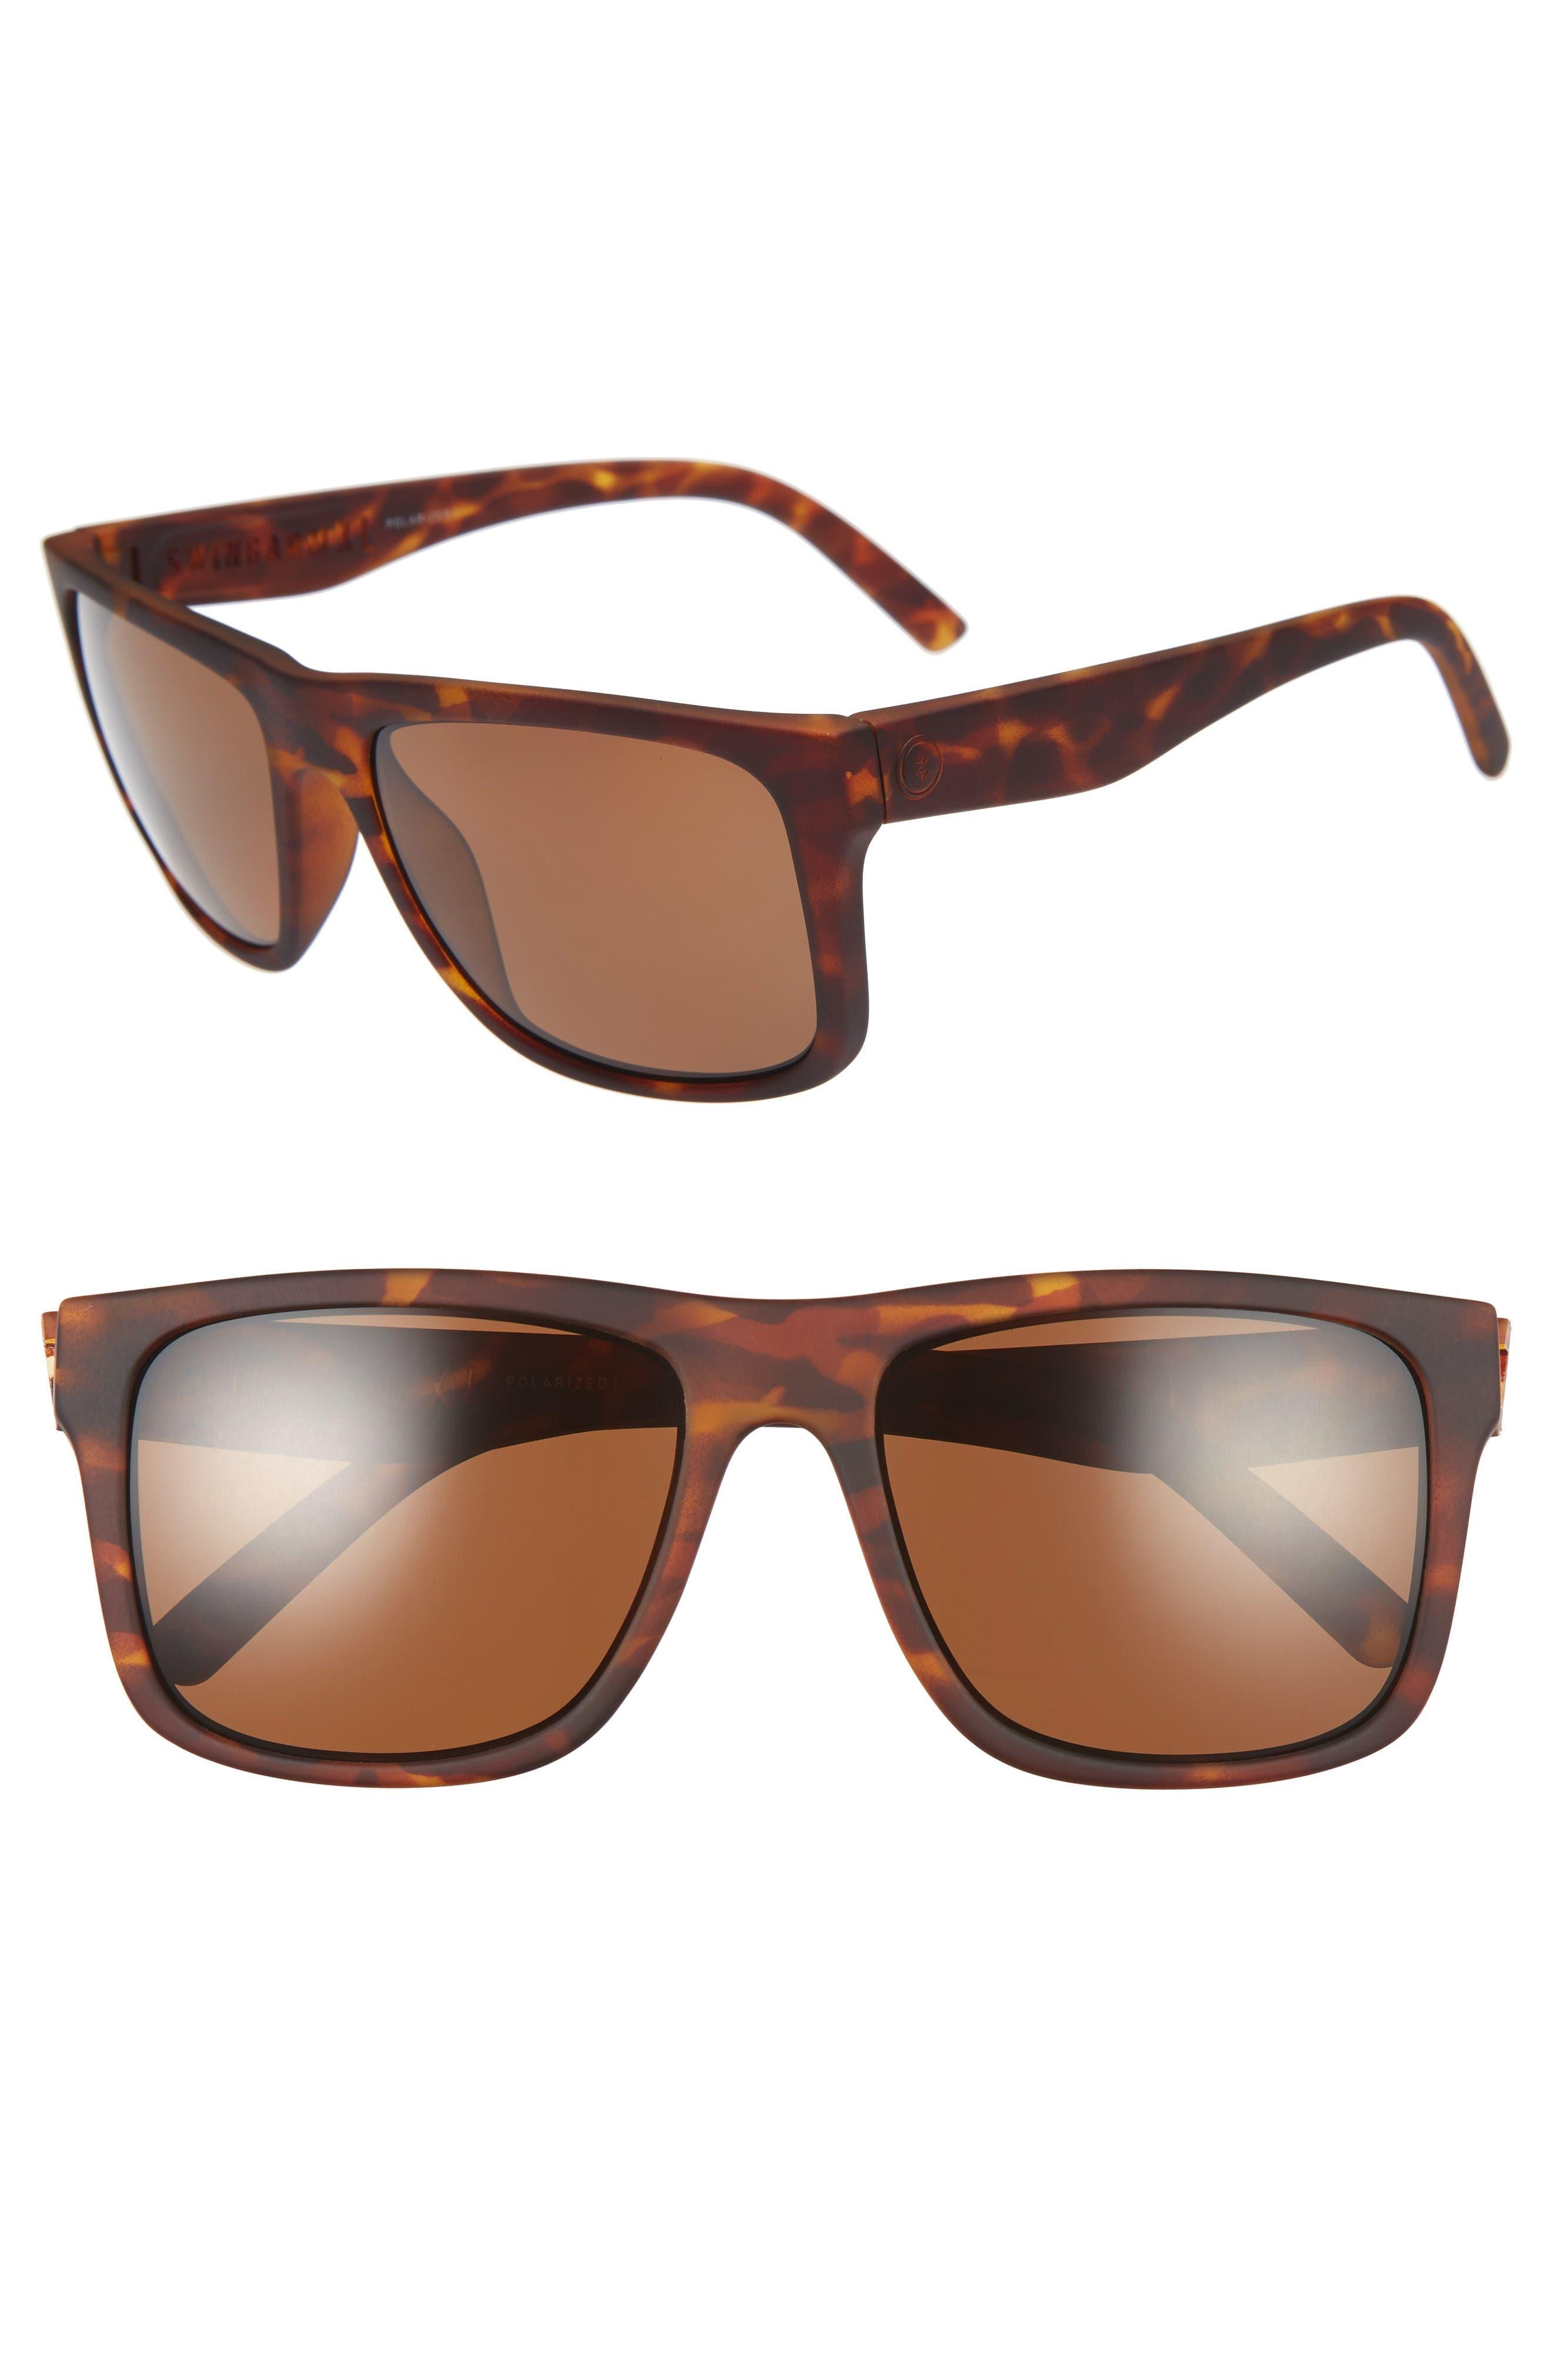 Main Image - ELECTRIC Swingarm XL 59mm Polarized Sunglasses